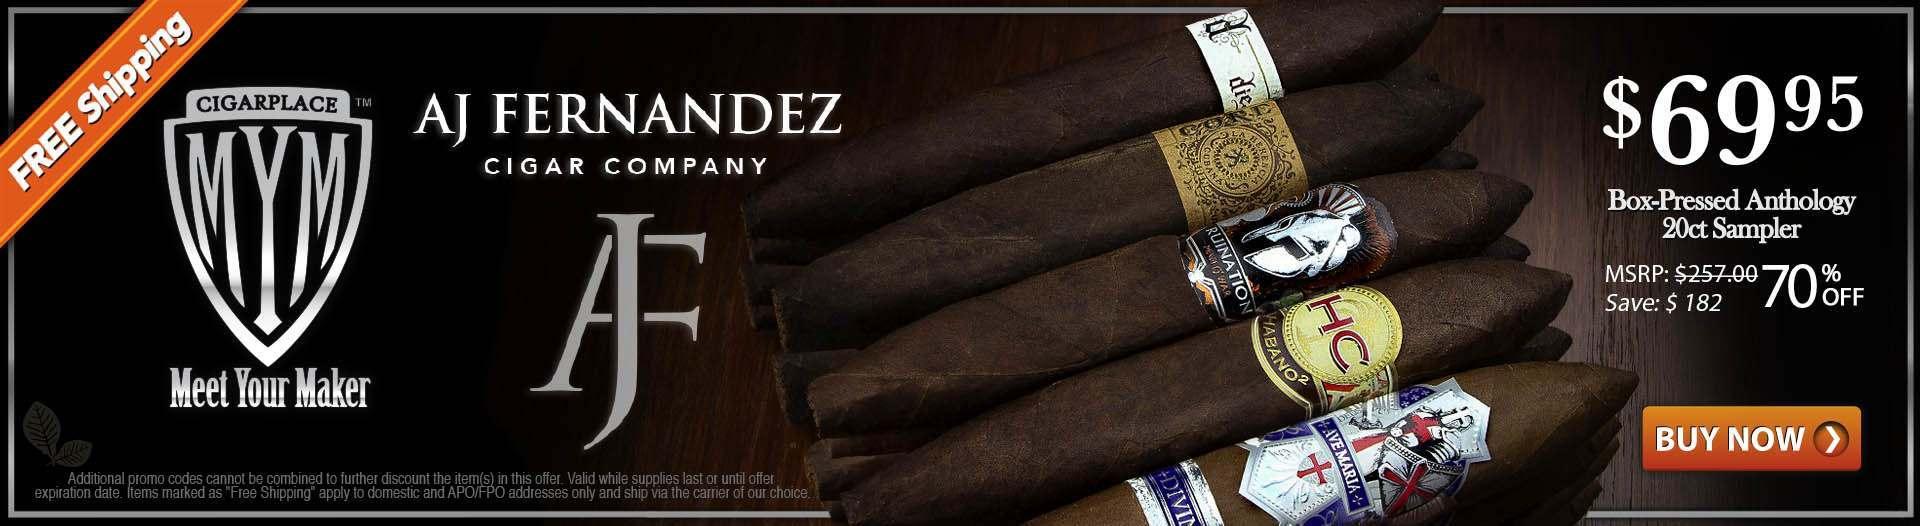 MYM AJ Fernandez Cigar Sampler